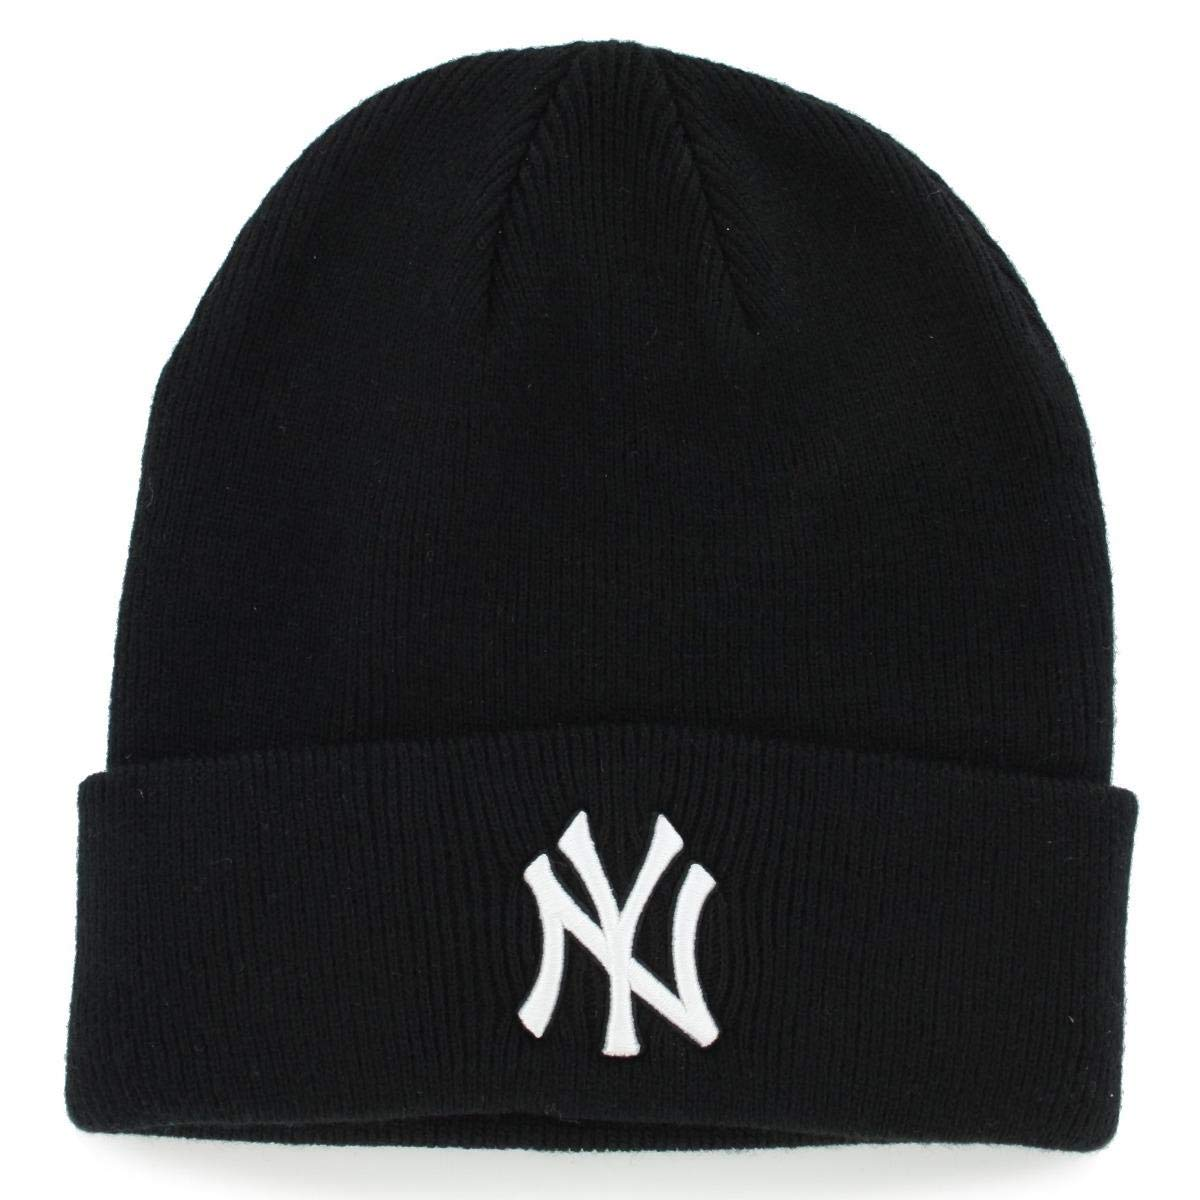 47 Brand Cuffed Beanie Hat MLB Raised Cuff Knit Cap